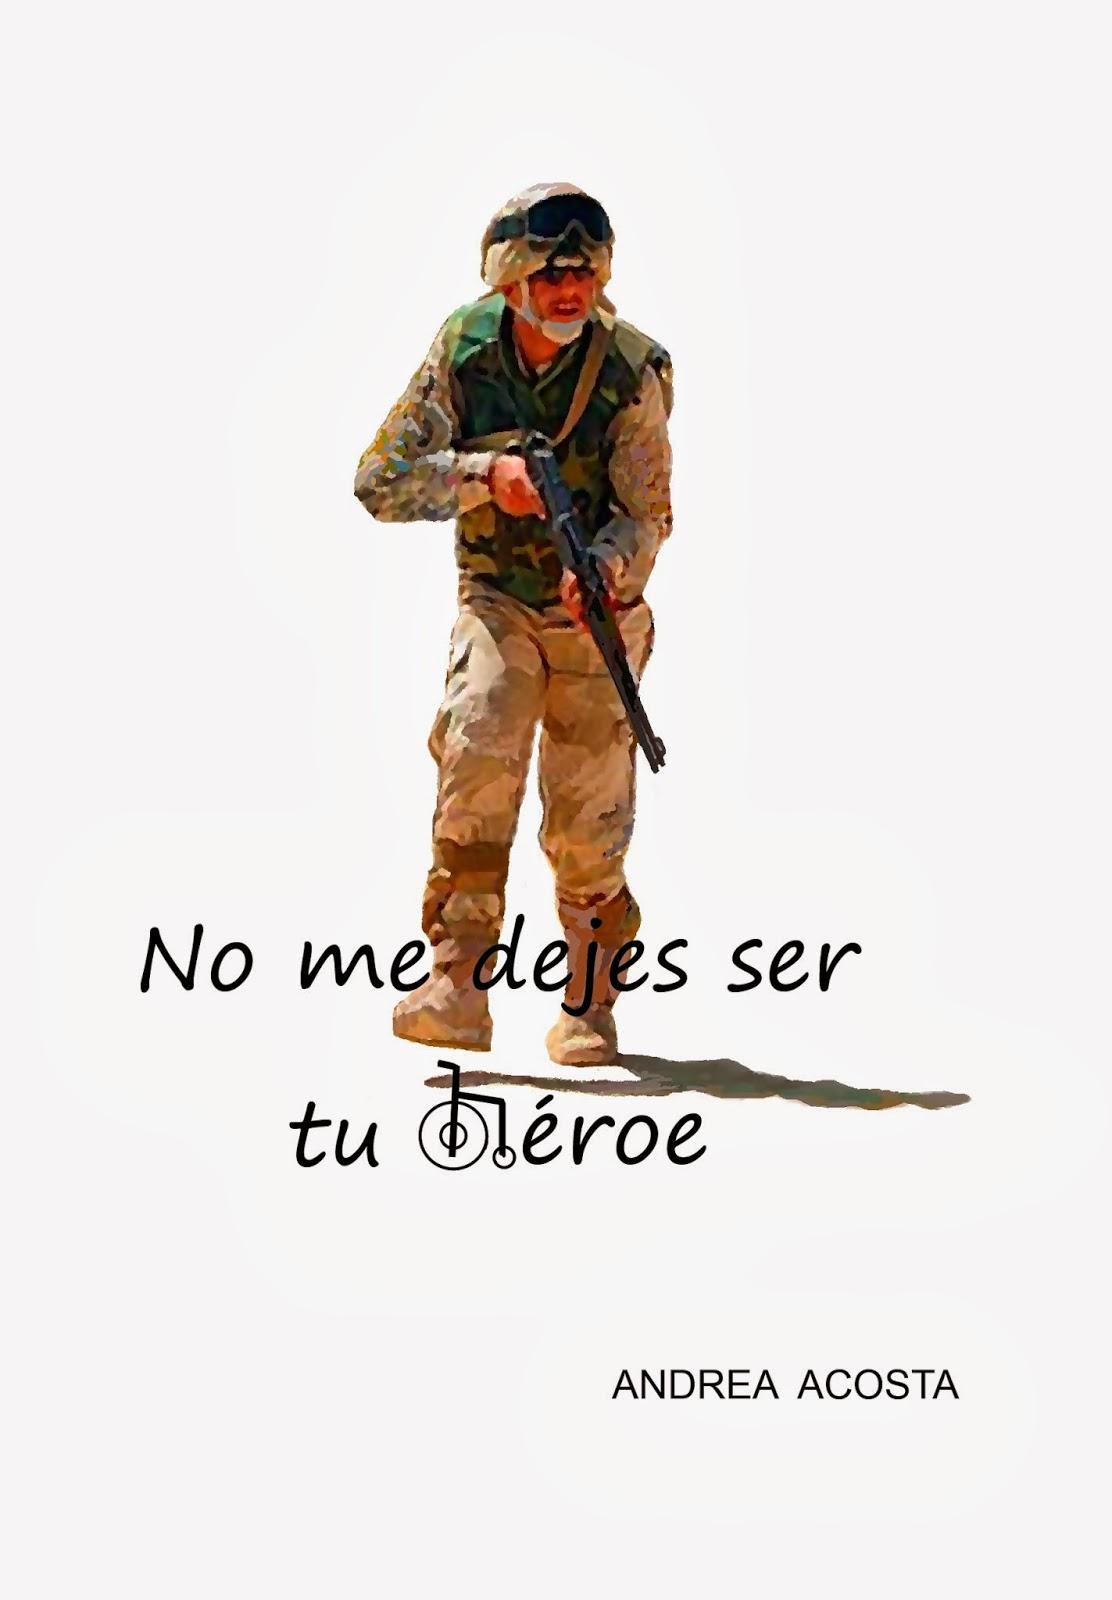 No me dejes ser tu héroe